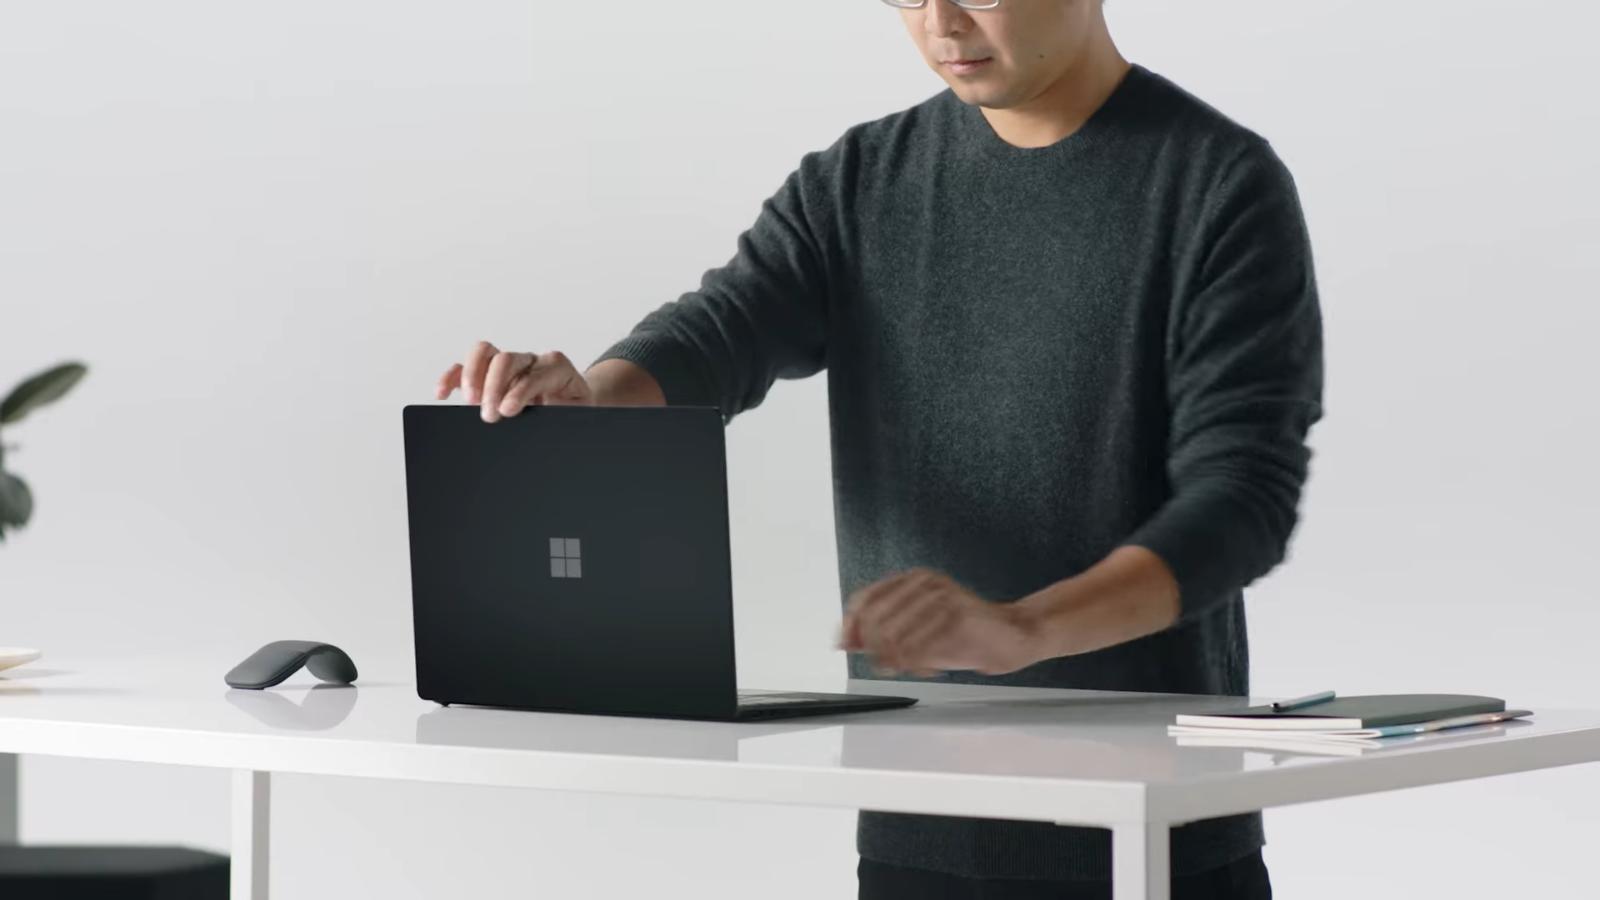 surface laptop 2, surface, usb-c, ports, surface laptop